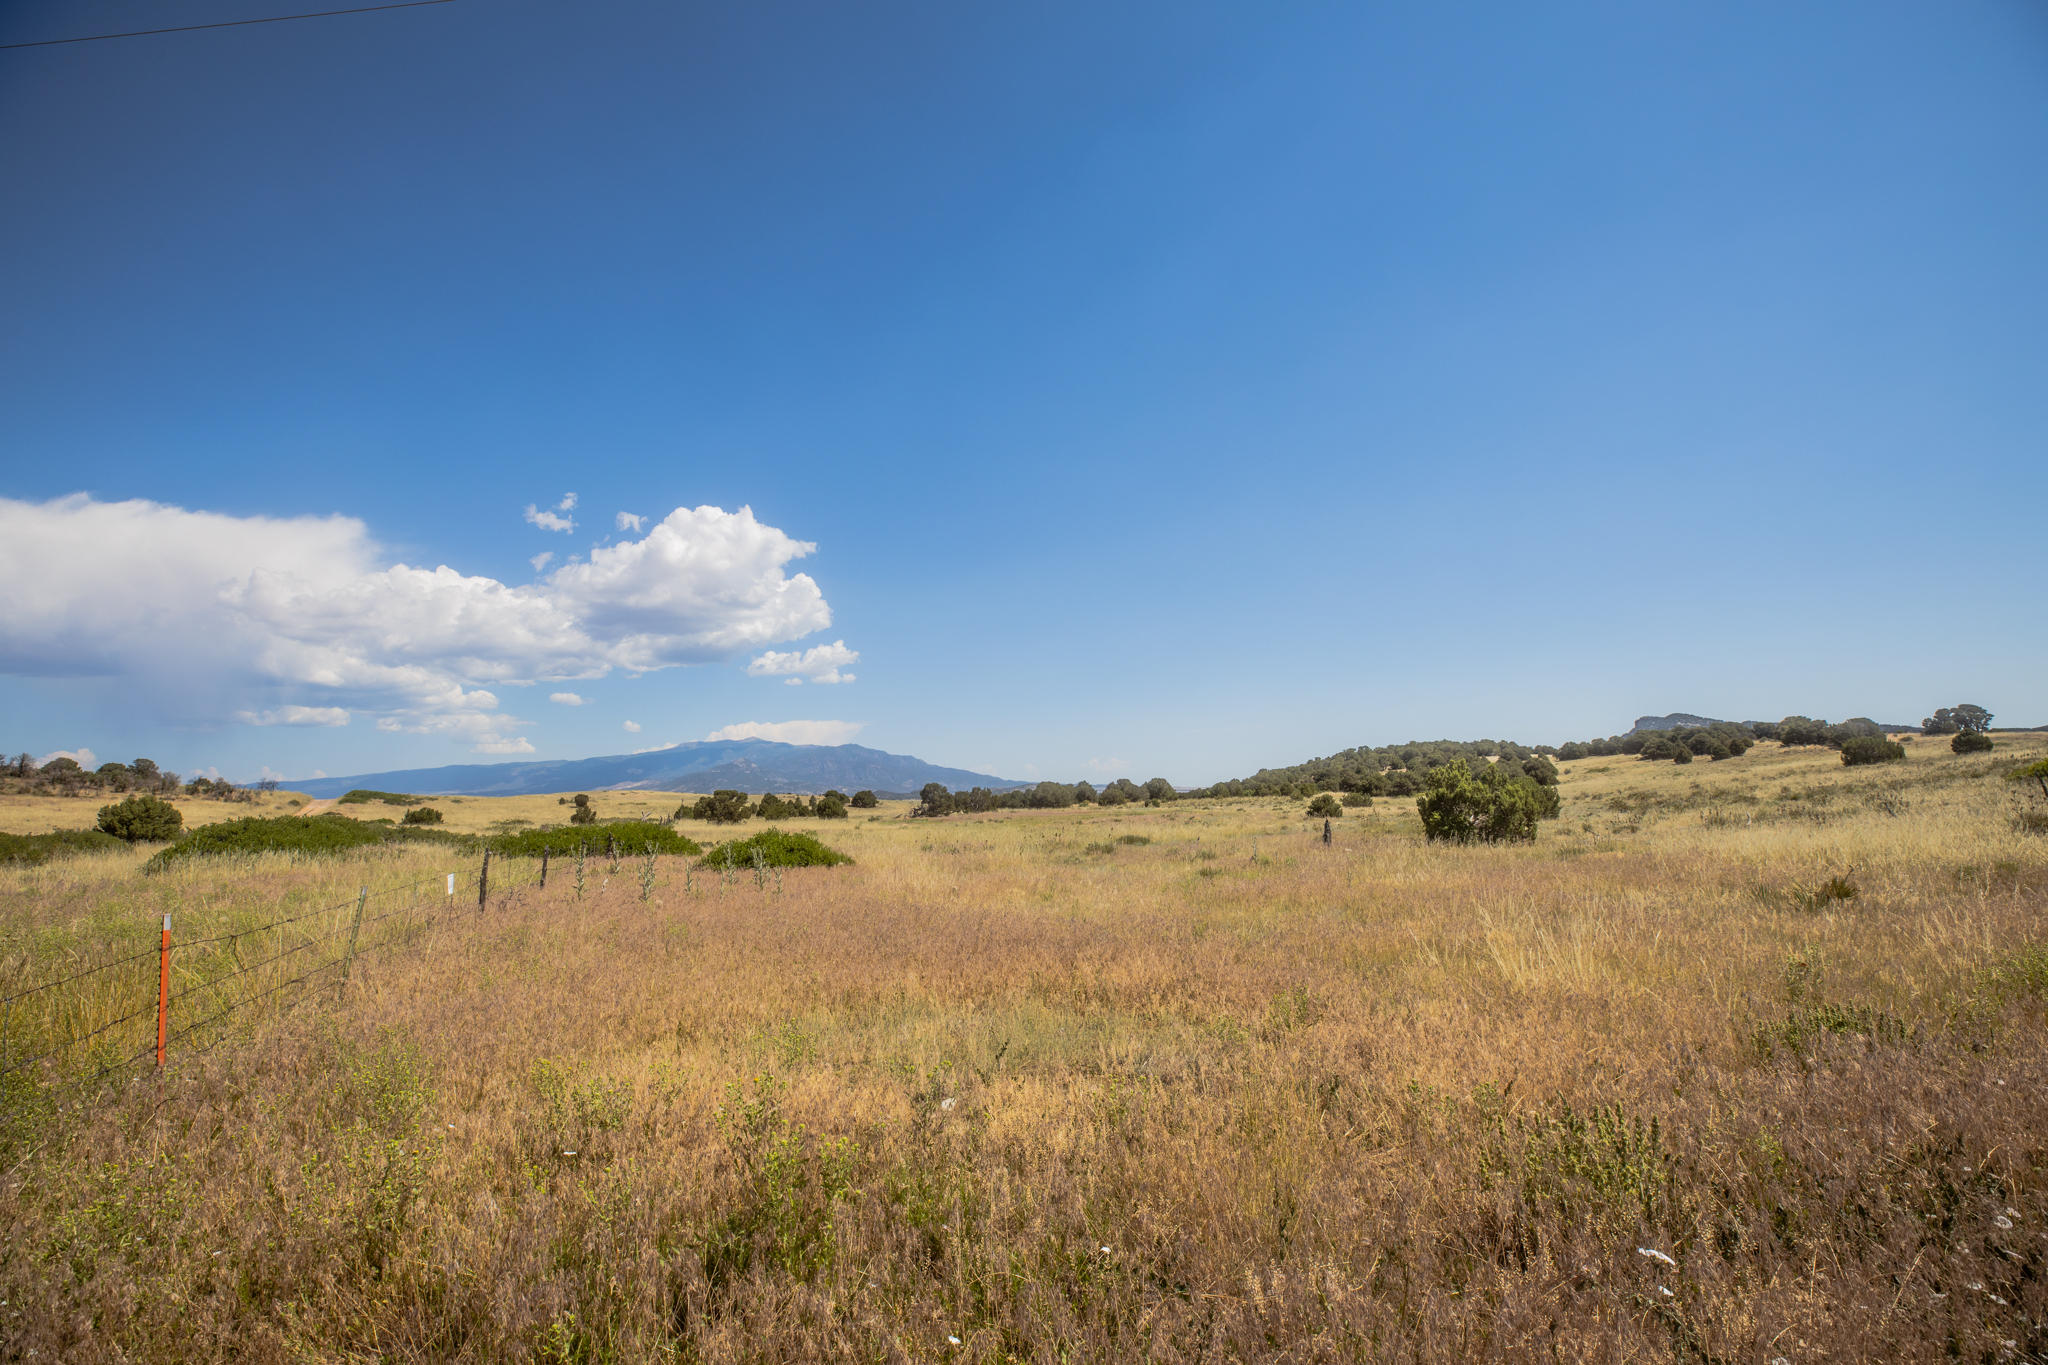 Property located at Lot 34 Majors Ranch Phase 3  Walsenburg CO 81089 photo